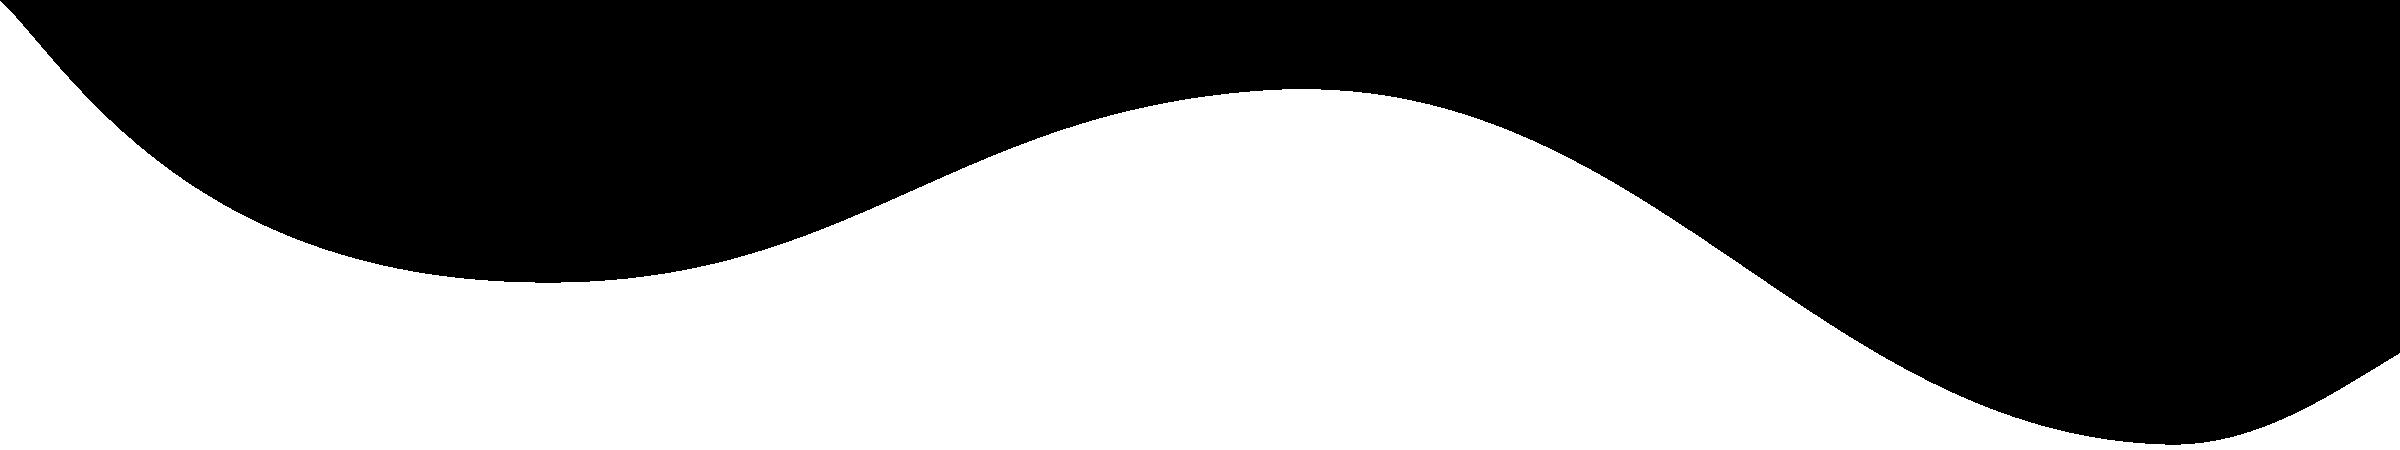 white separator